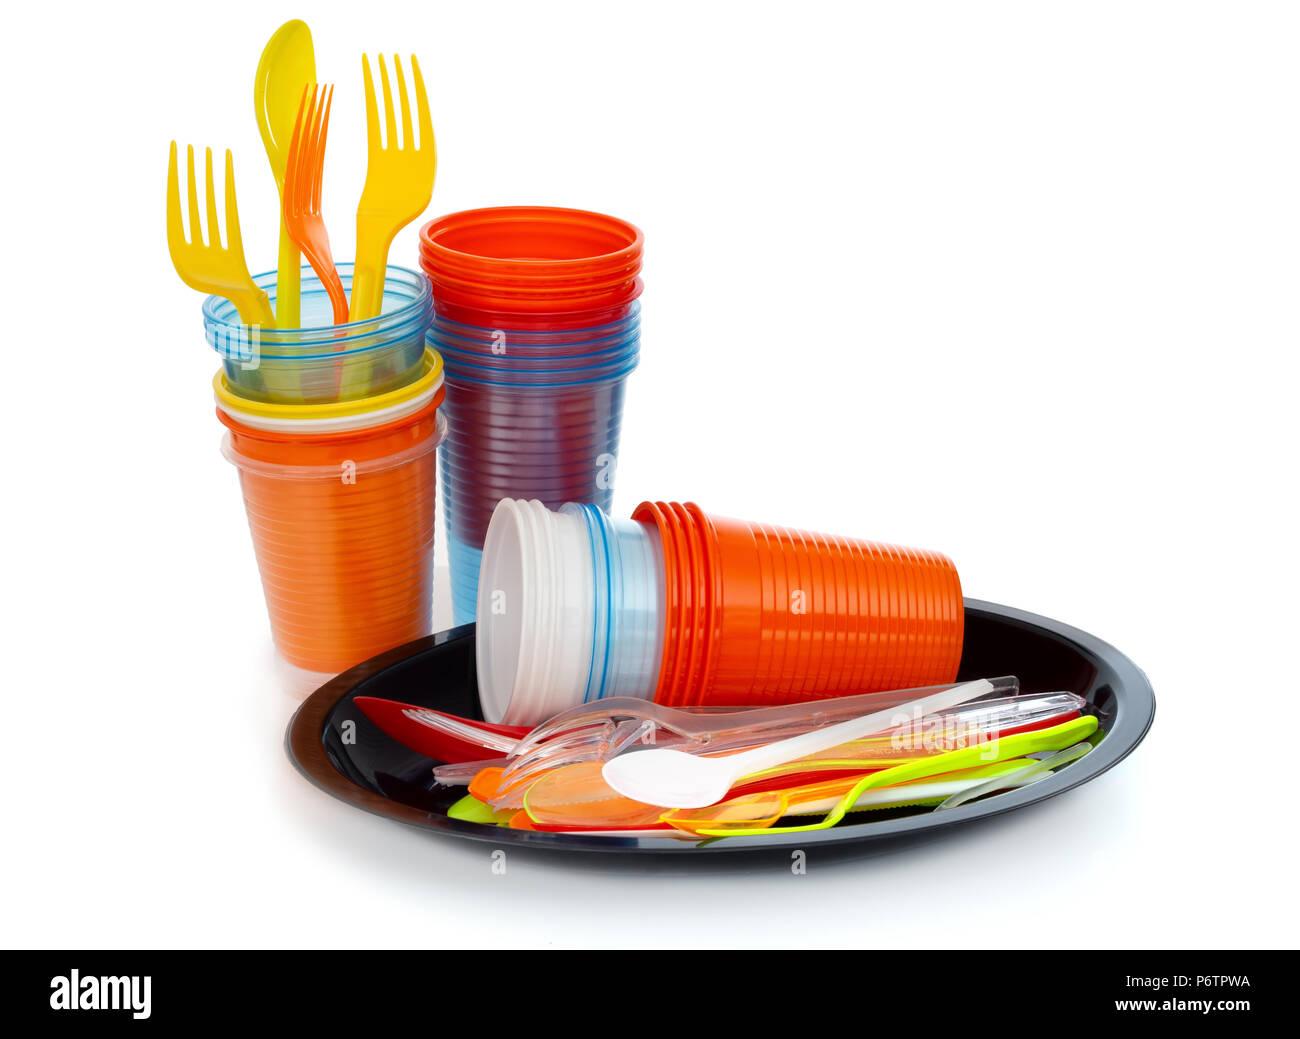 Single-use plastics, EU European directive to help environment. - Stock Image